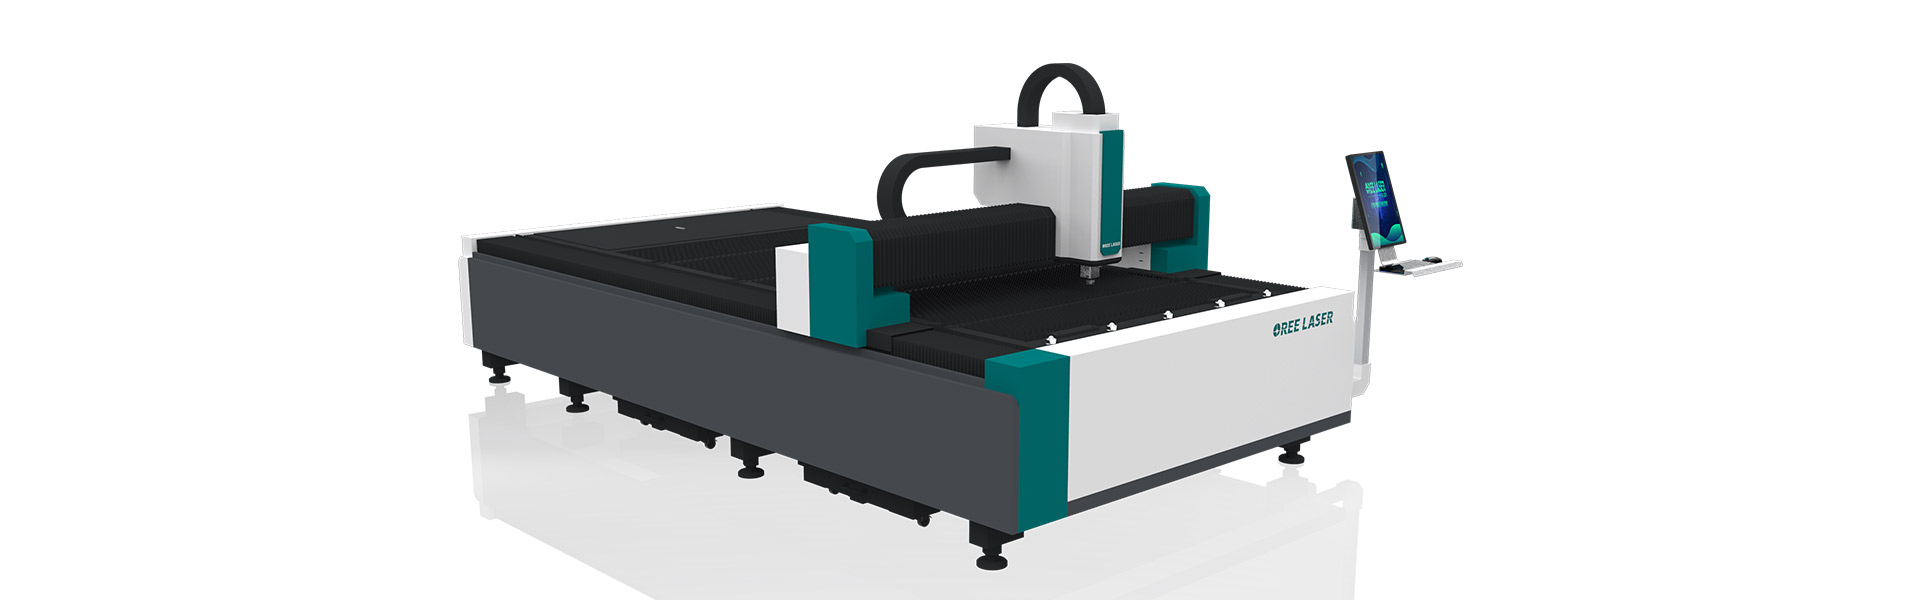 máy cắt laser kim loại 500W - 2000W